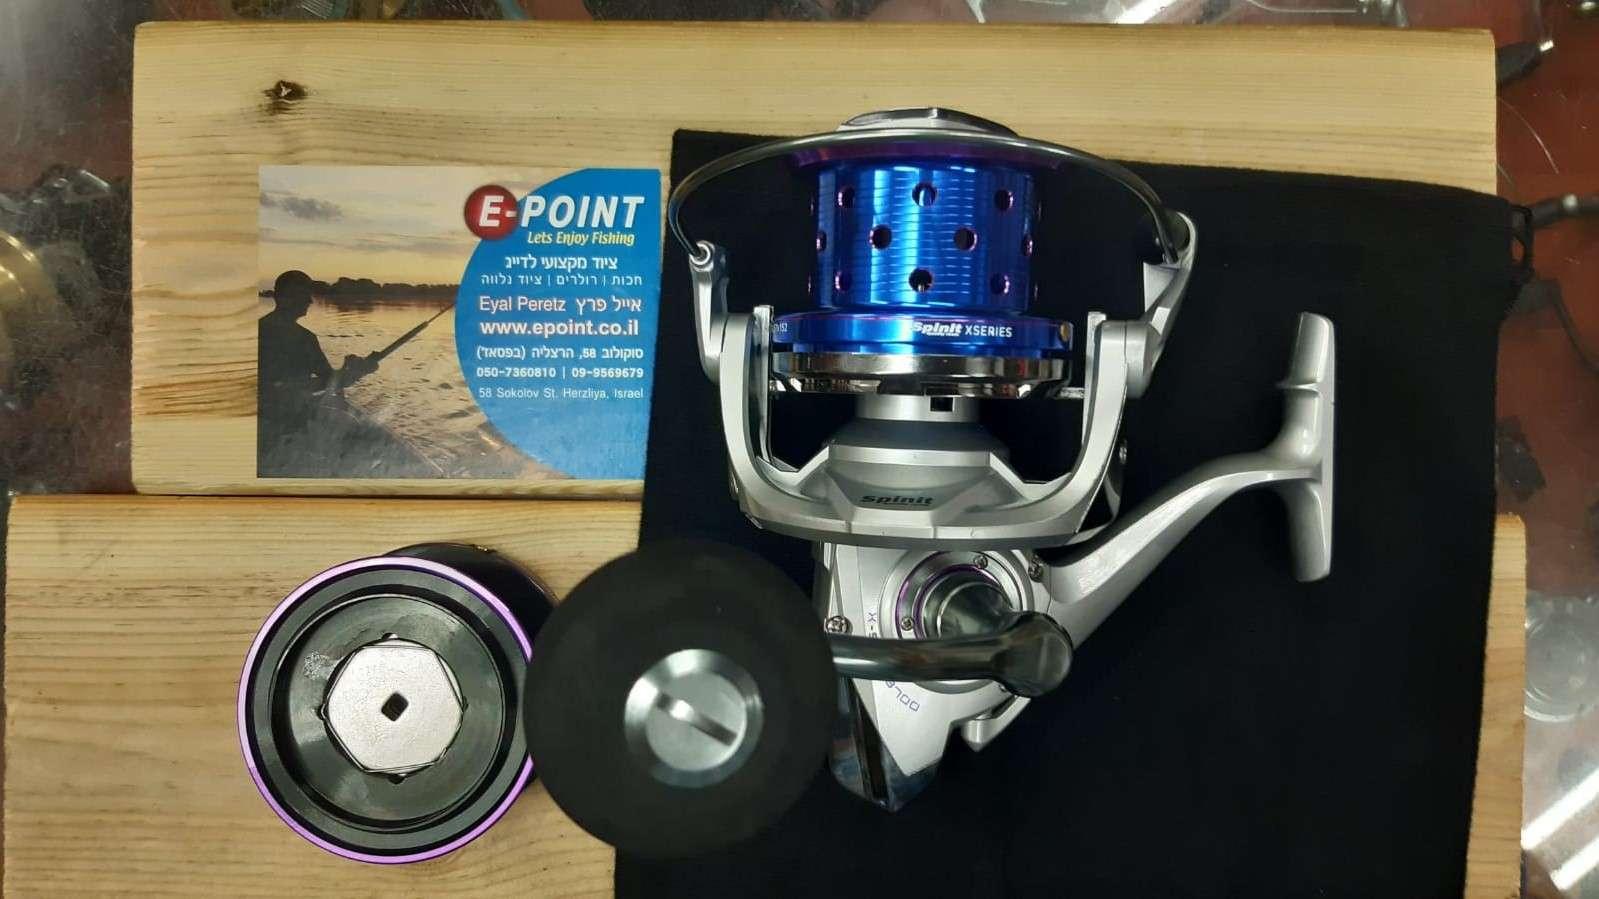 KaliKunnan SPINIT X-SURF 8700DP